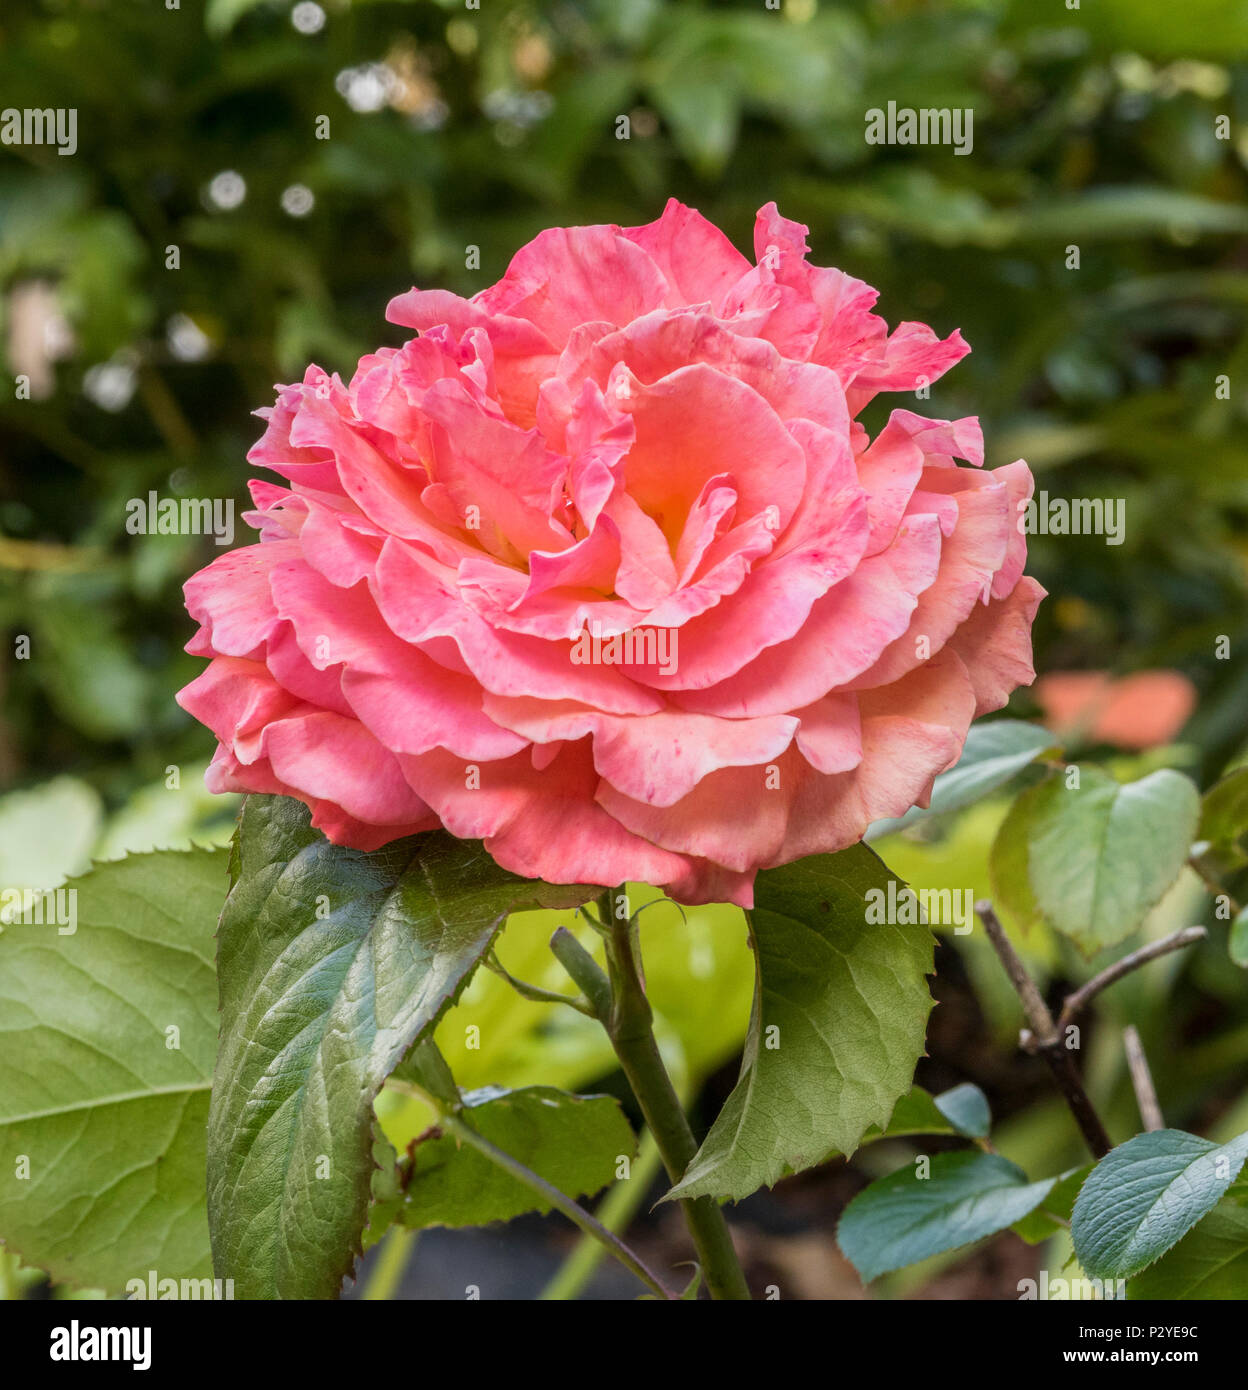 Tatton 'Fryentice',  floribunda rose - Stock Image